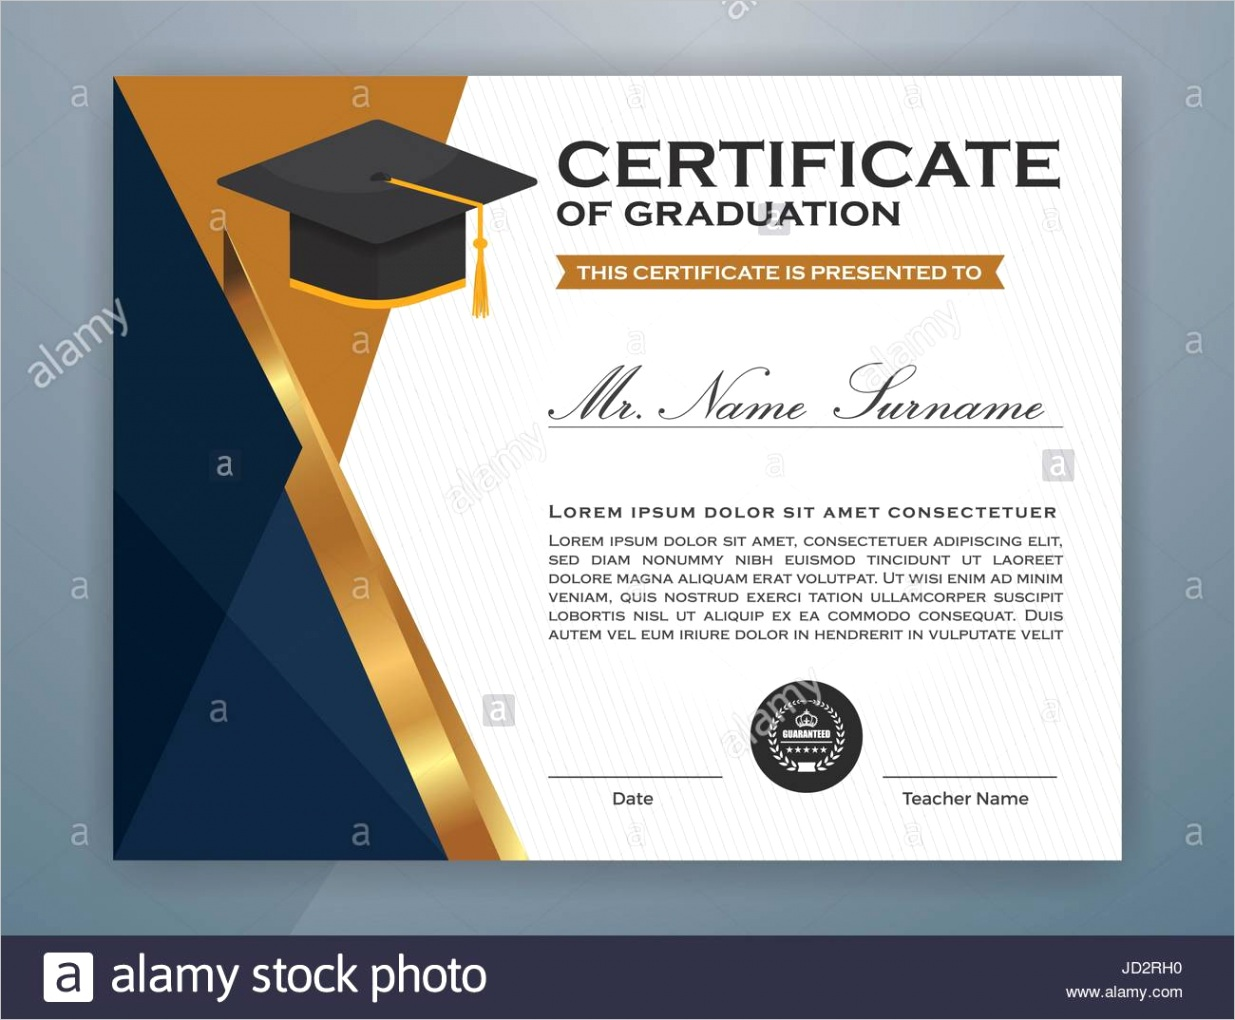 stock photo high school diploma certificate template design with graduate cap ml